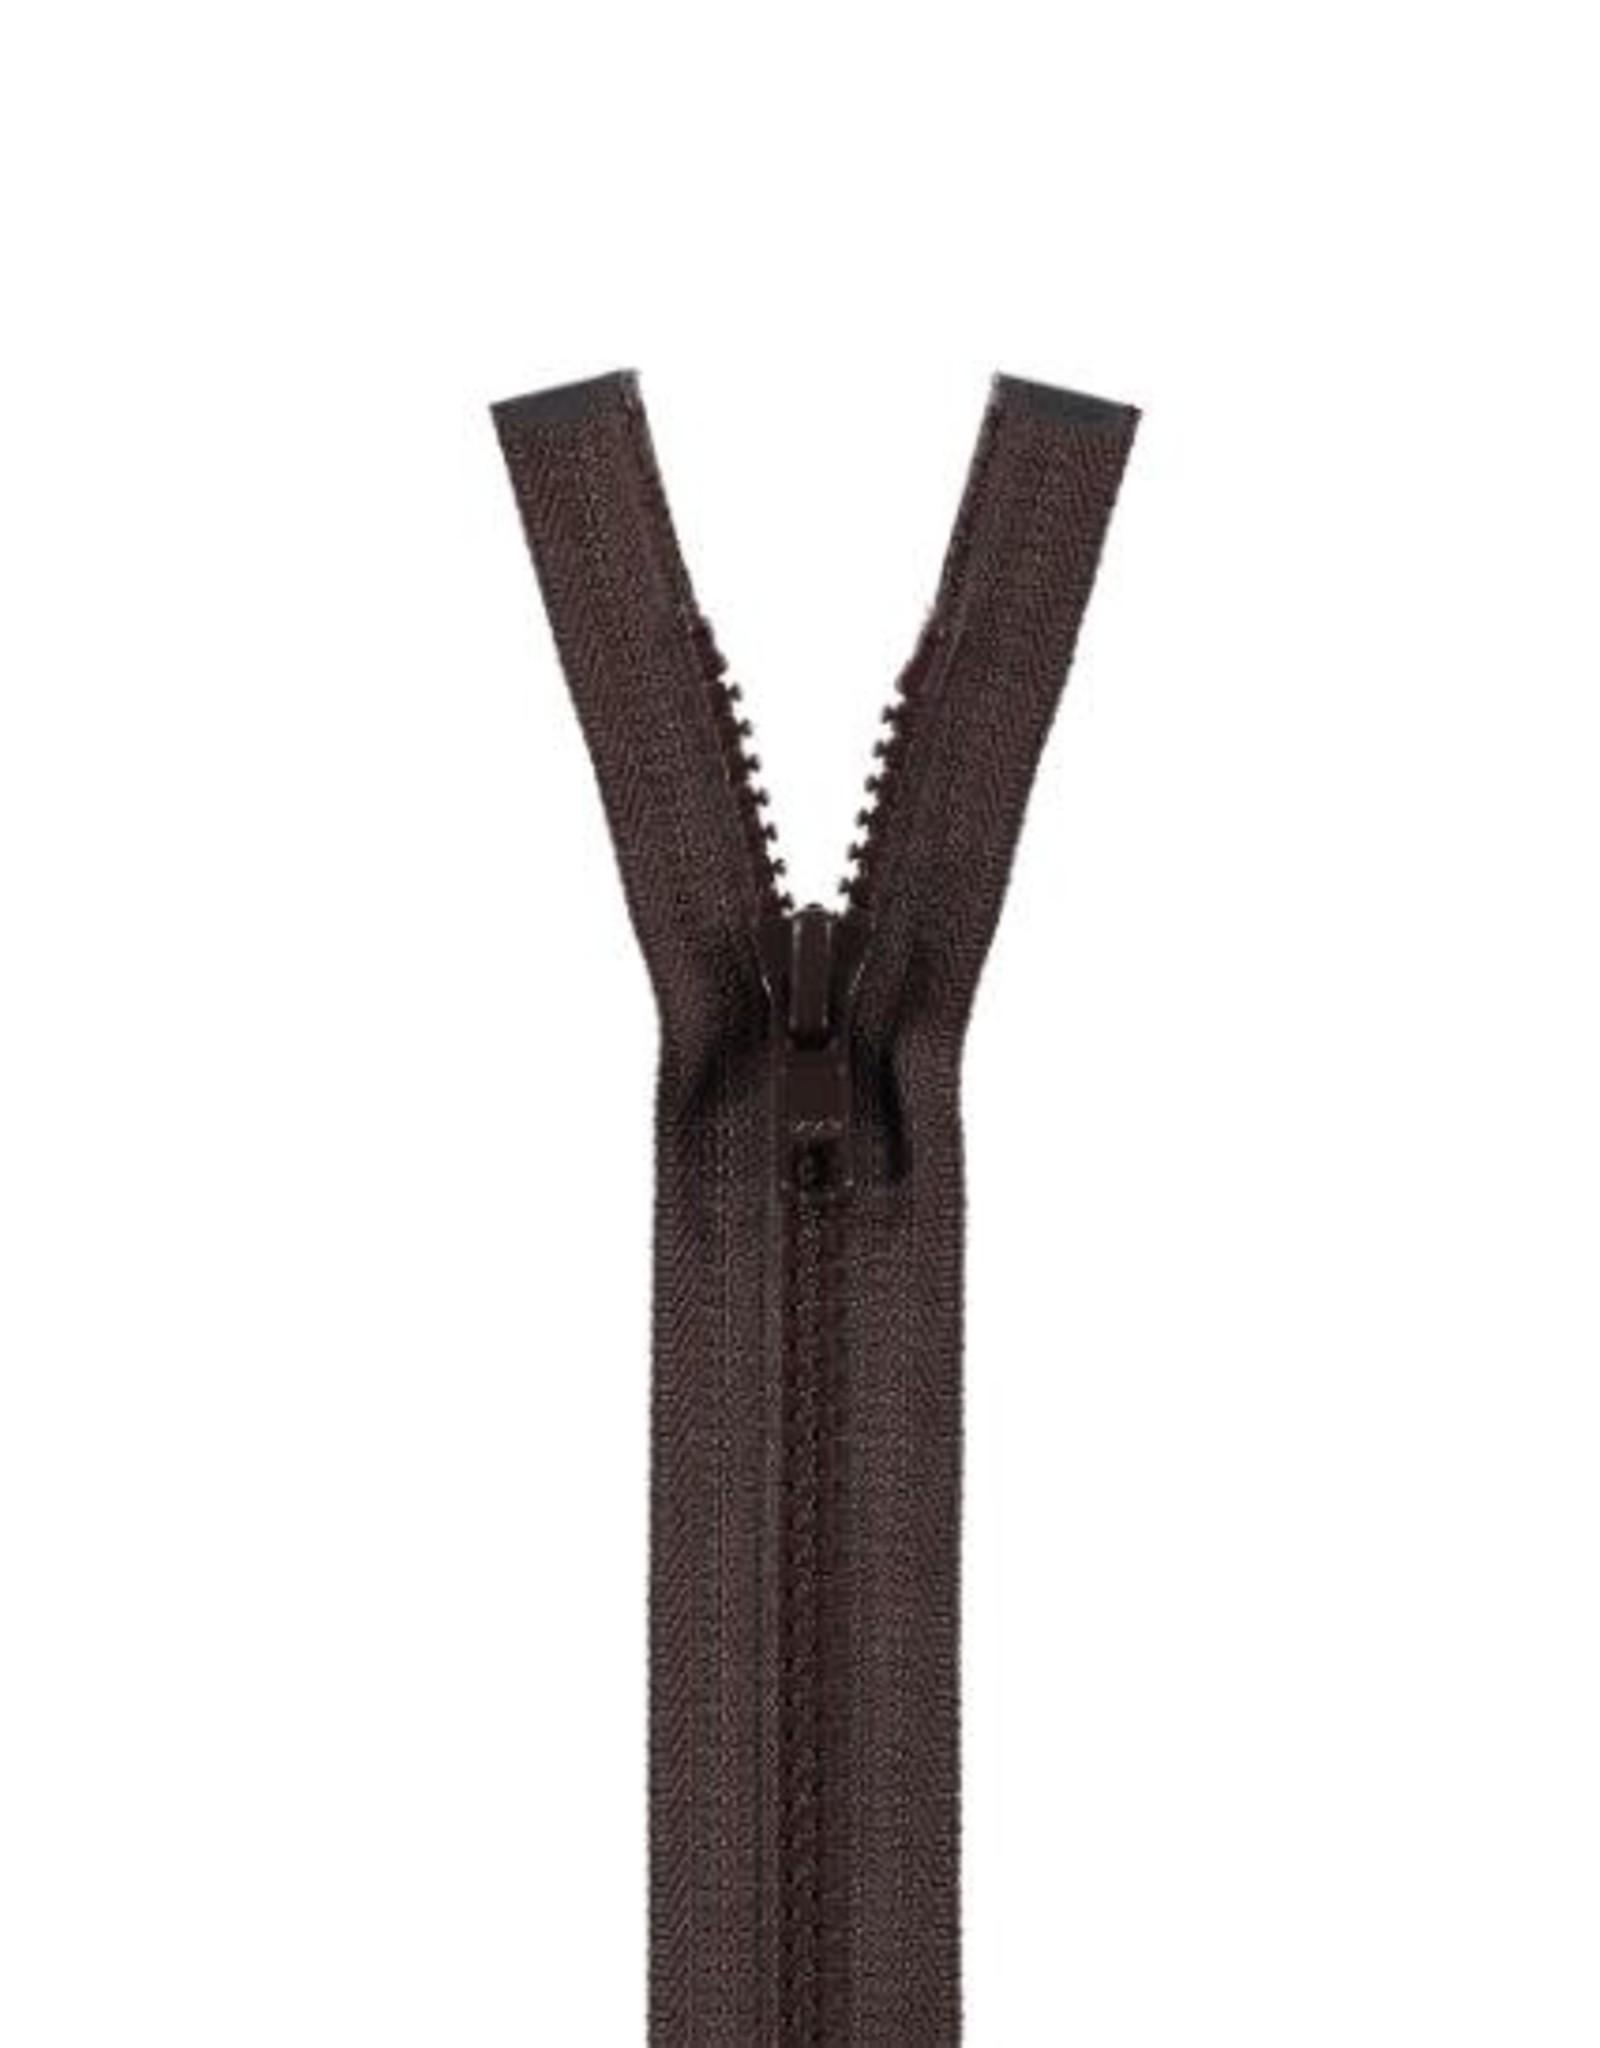 YKK BLOKRITS 5 DEELBAAR bruin 570-55cm